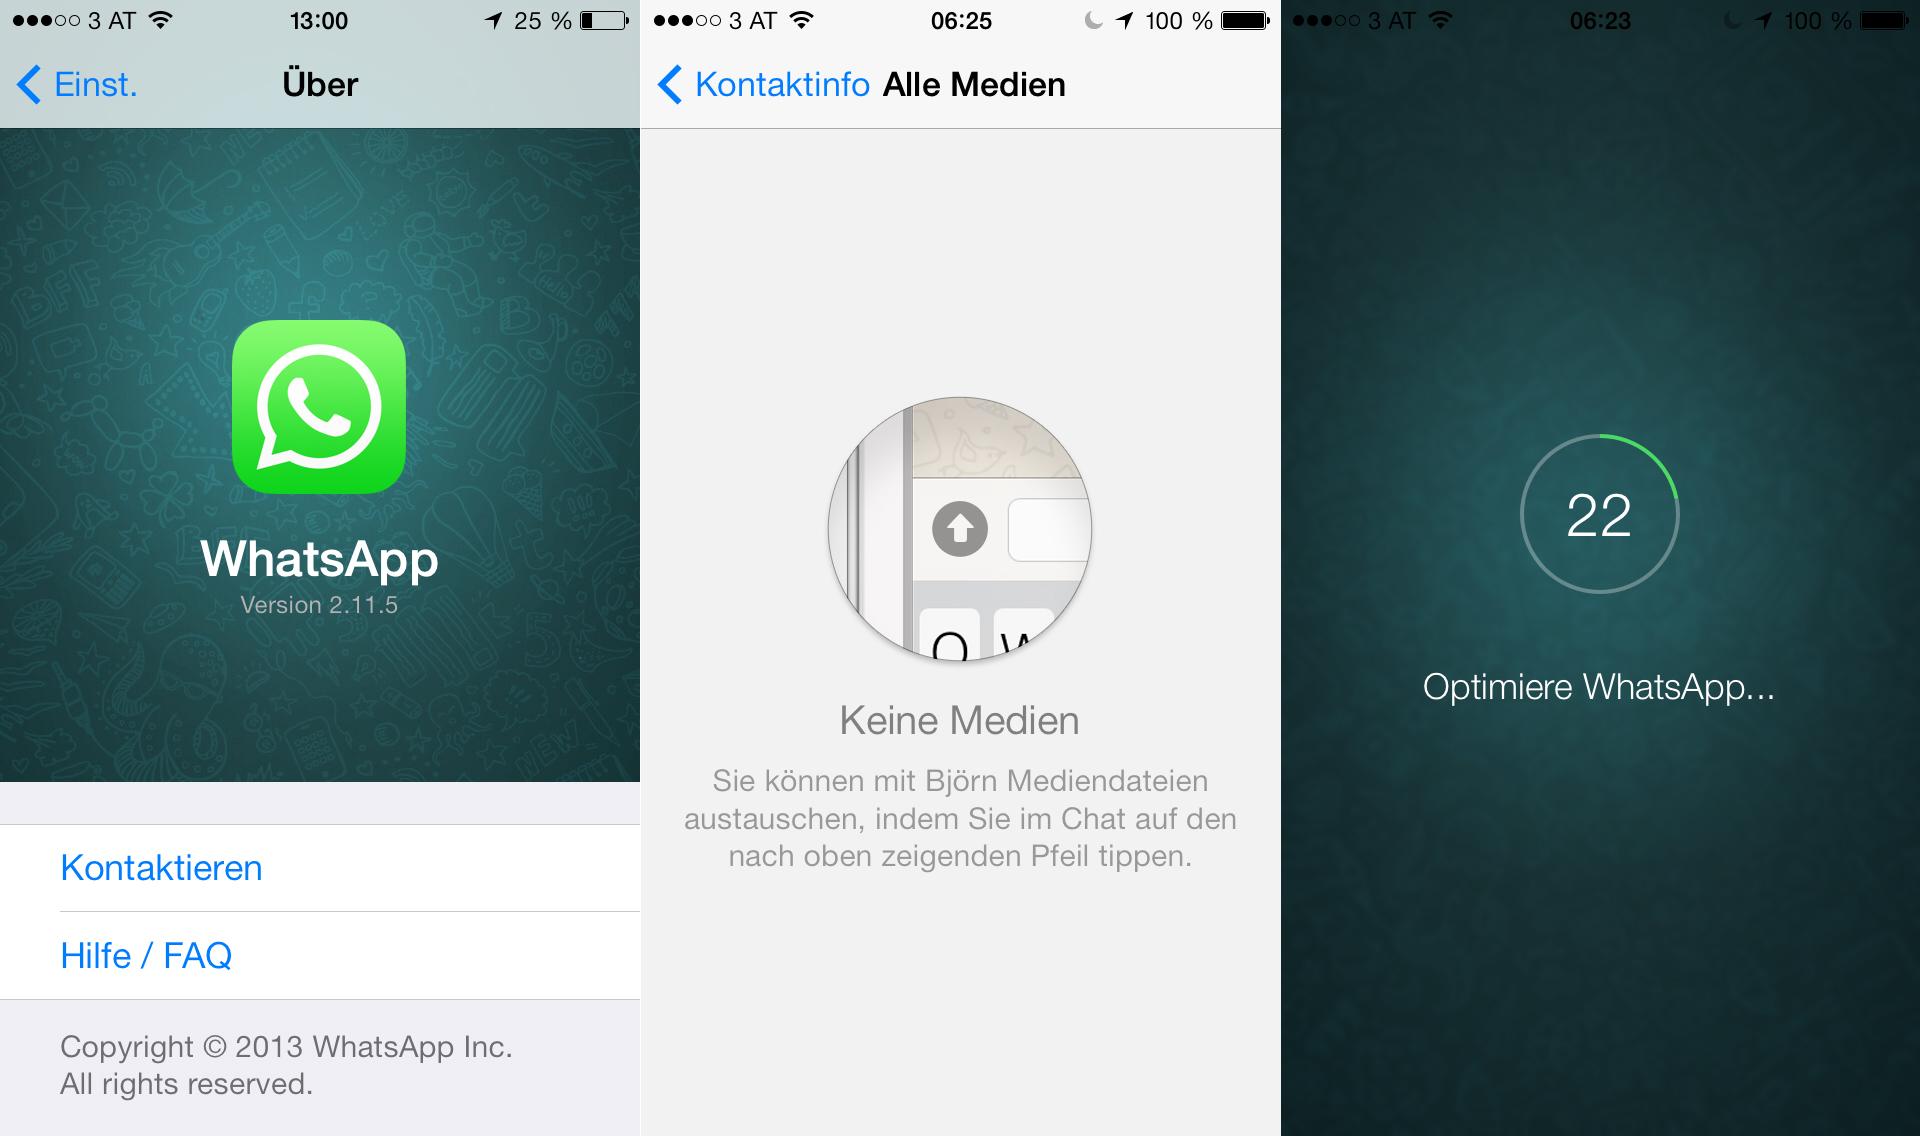 WhatsApp Update - Review - Änderungen - Bugs beheben - Absturz - Fehler - optimieren - Hack4Life - iPhon - kostenlos